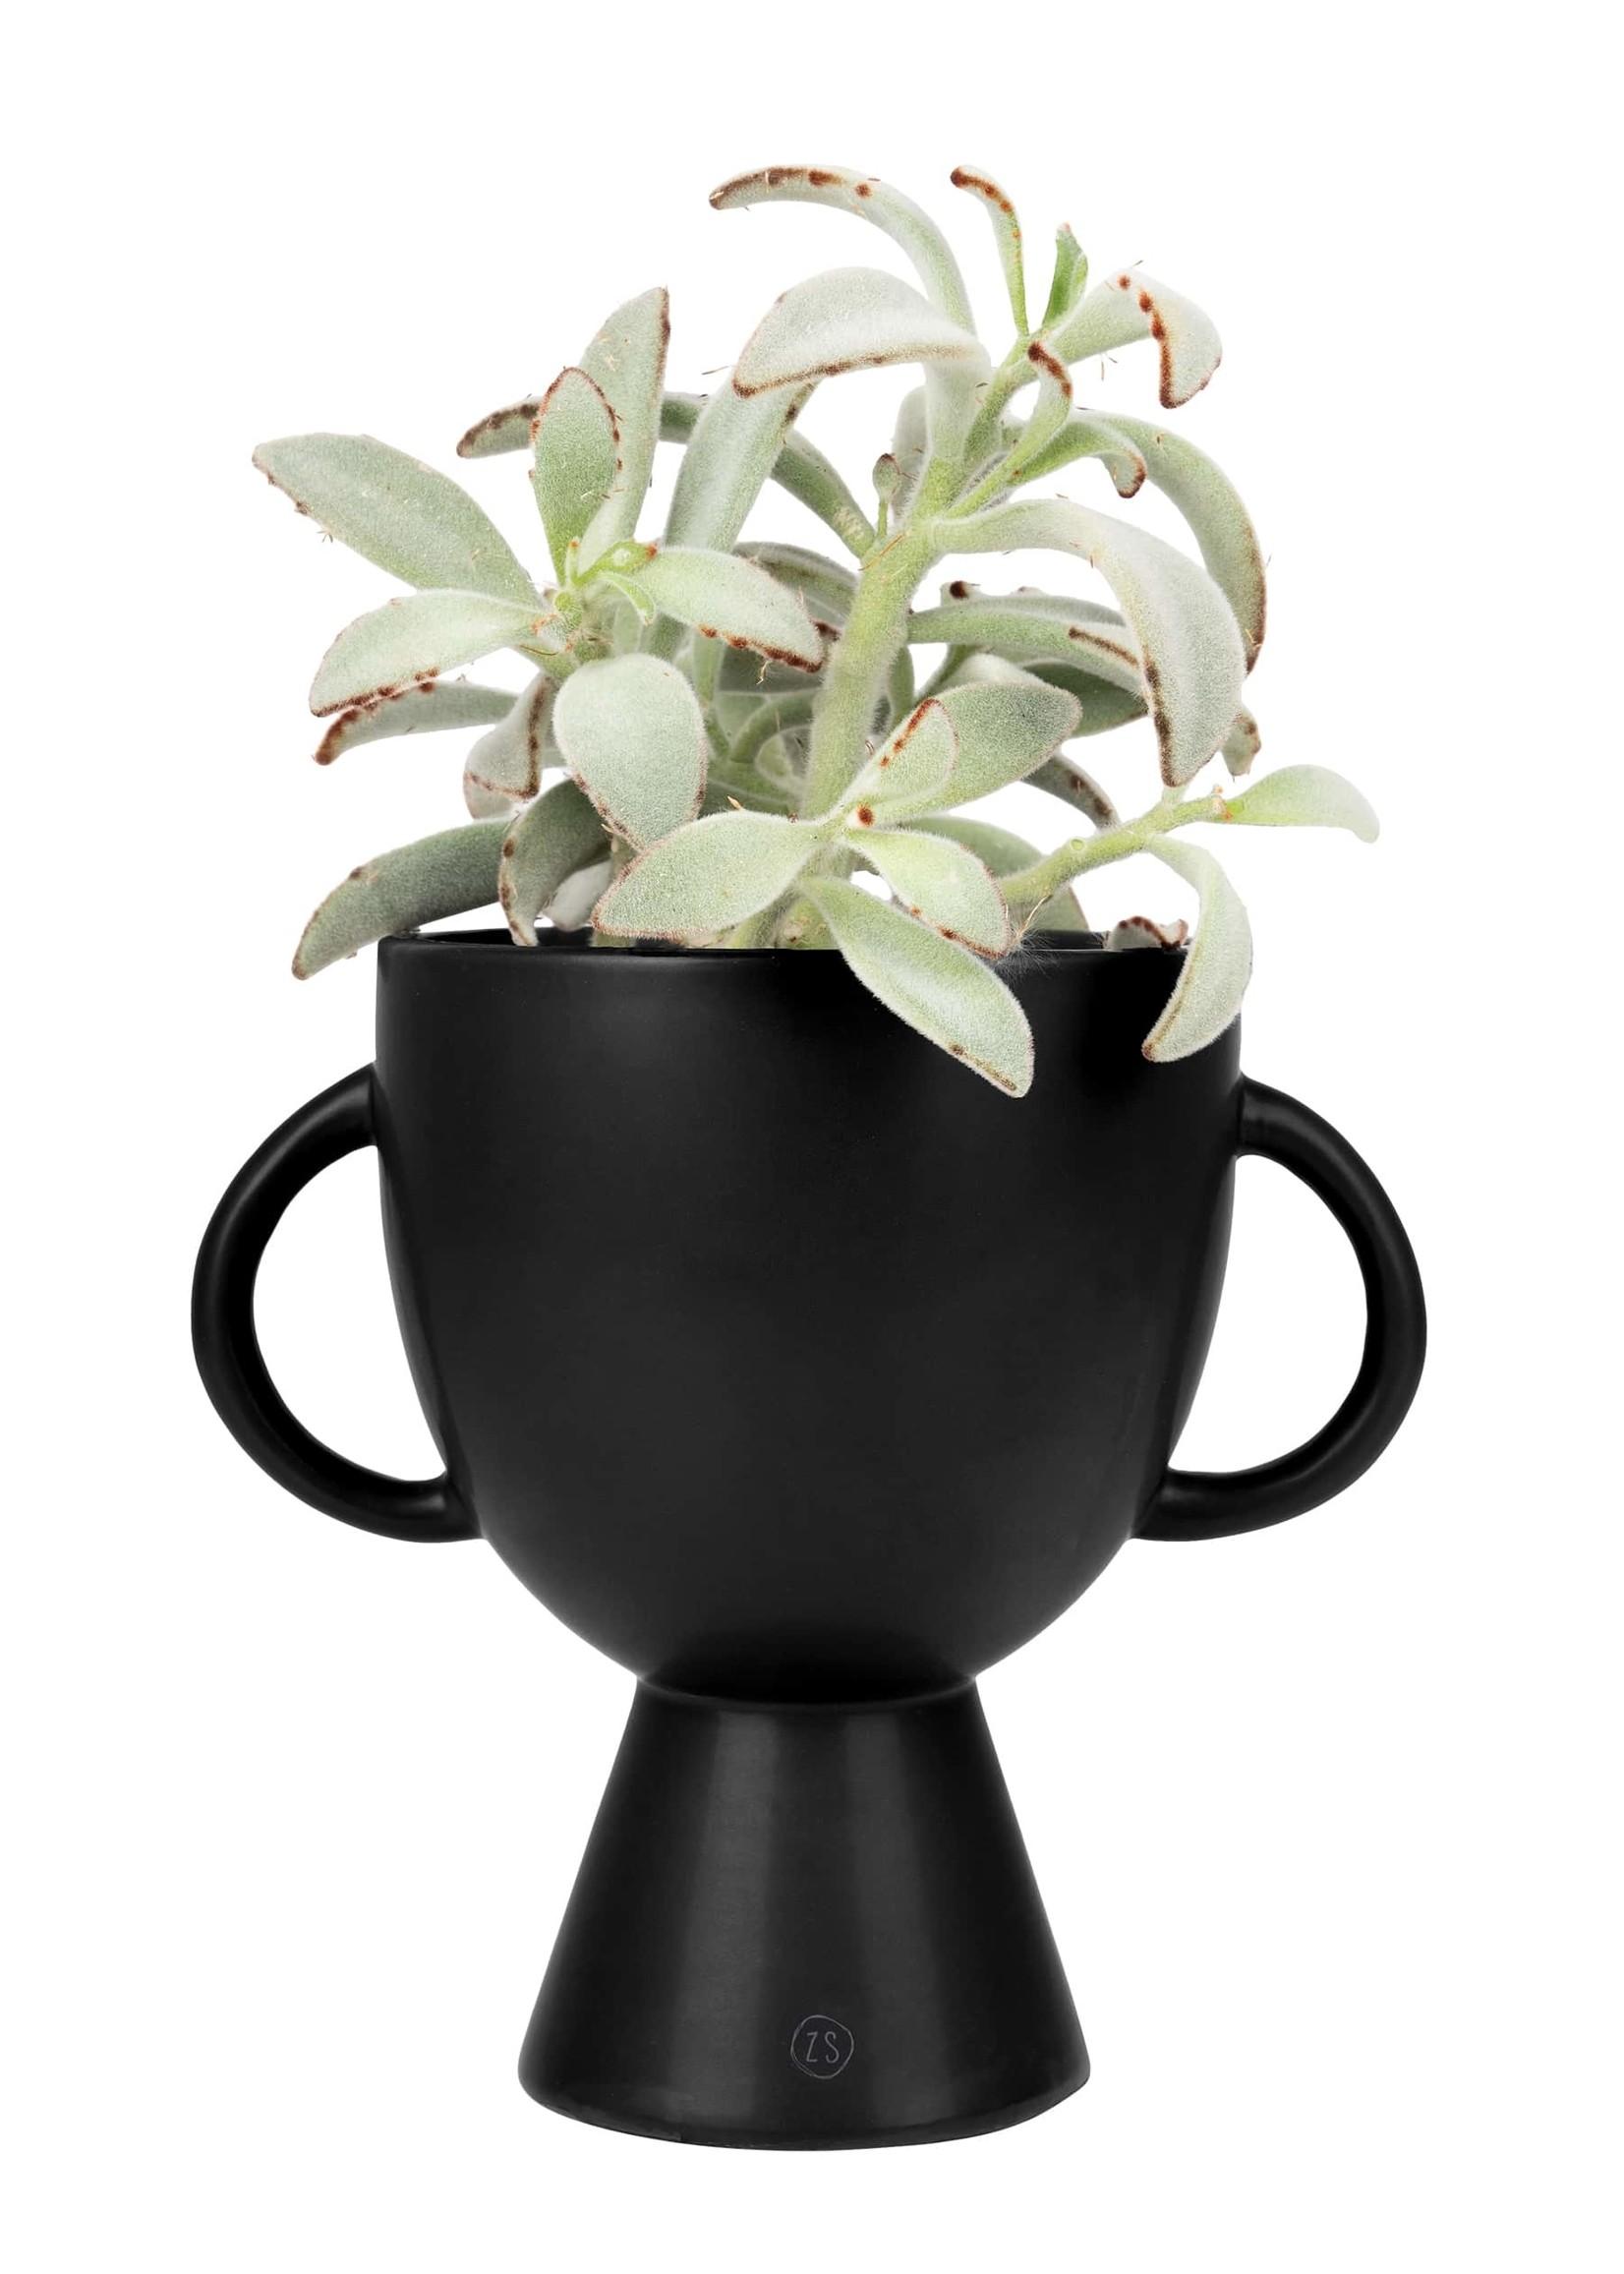 ZUSSS bloempot met handvatten keramiek ø15x20cm zwart